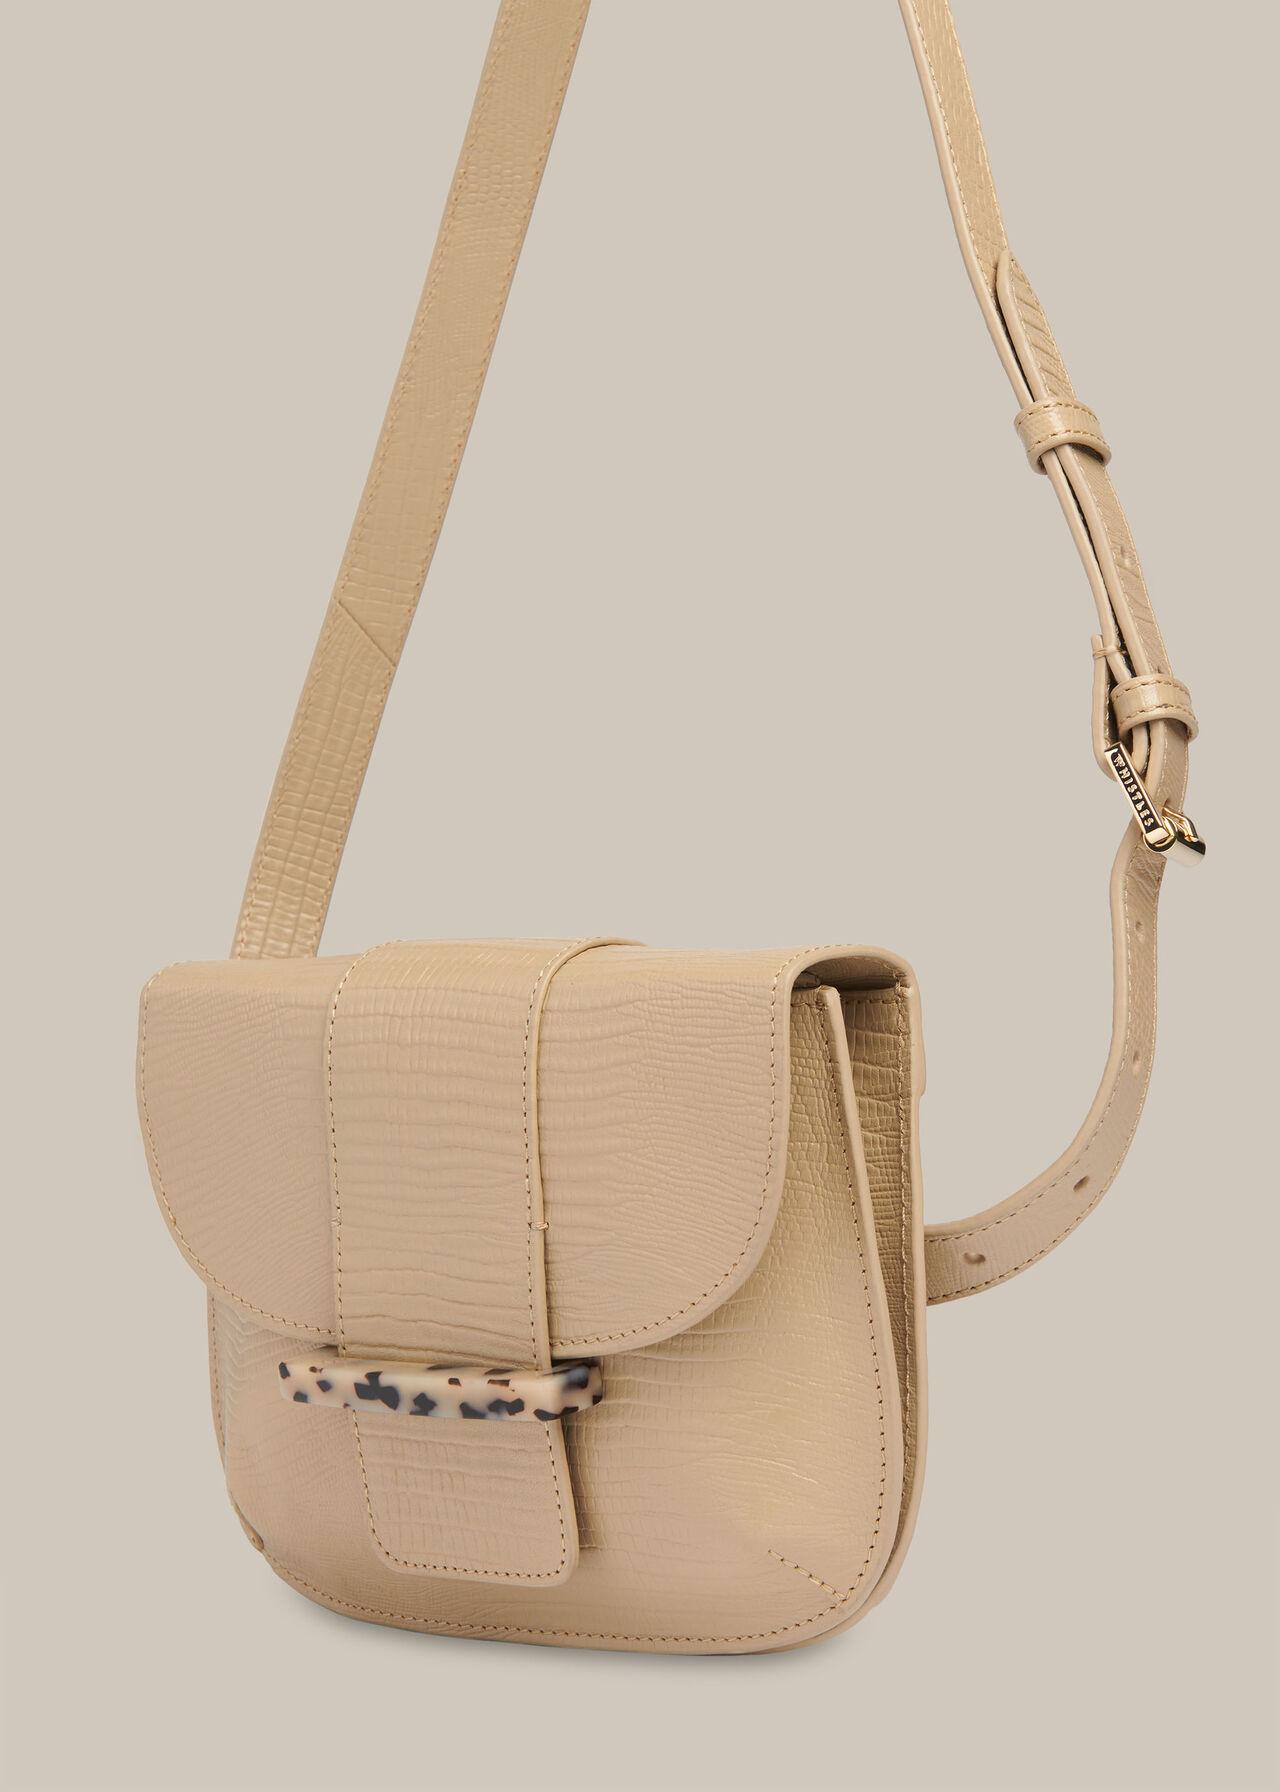 Mari Lizard Belt Bag